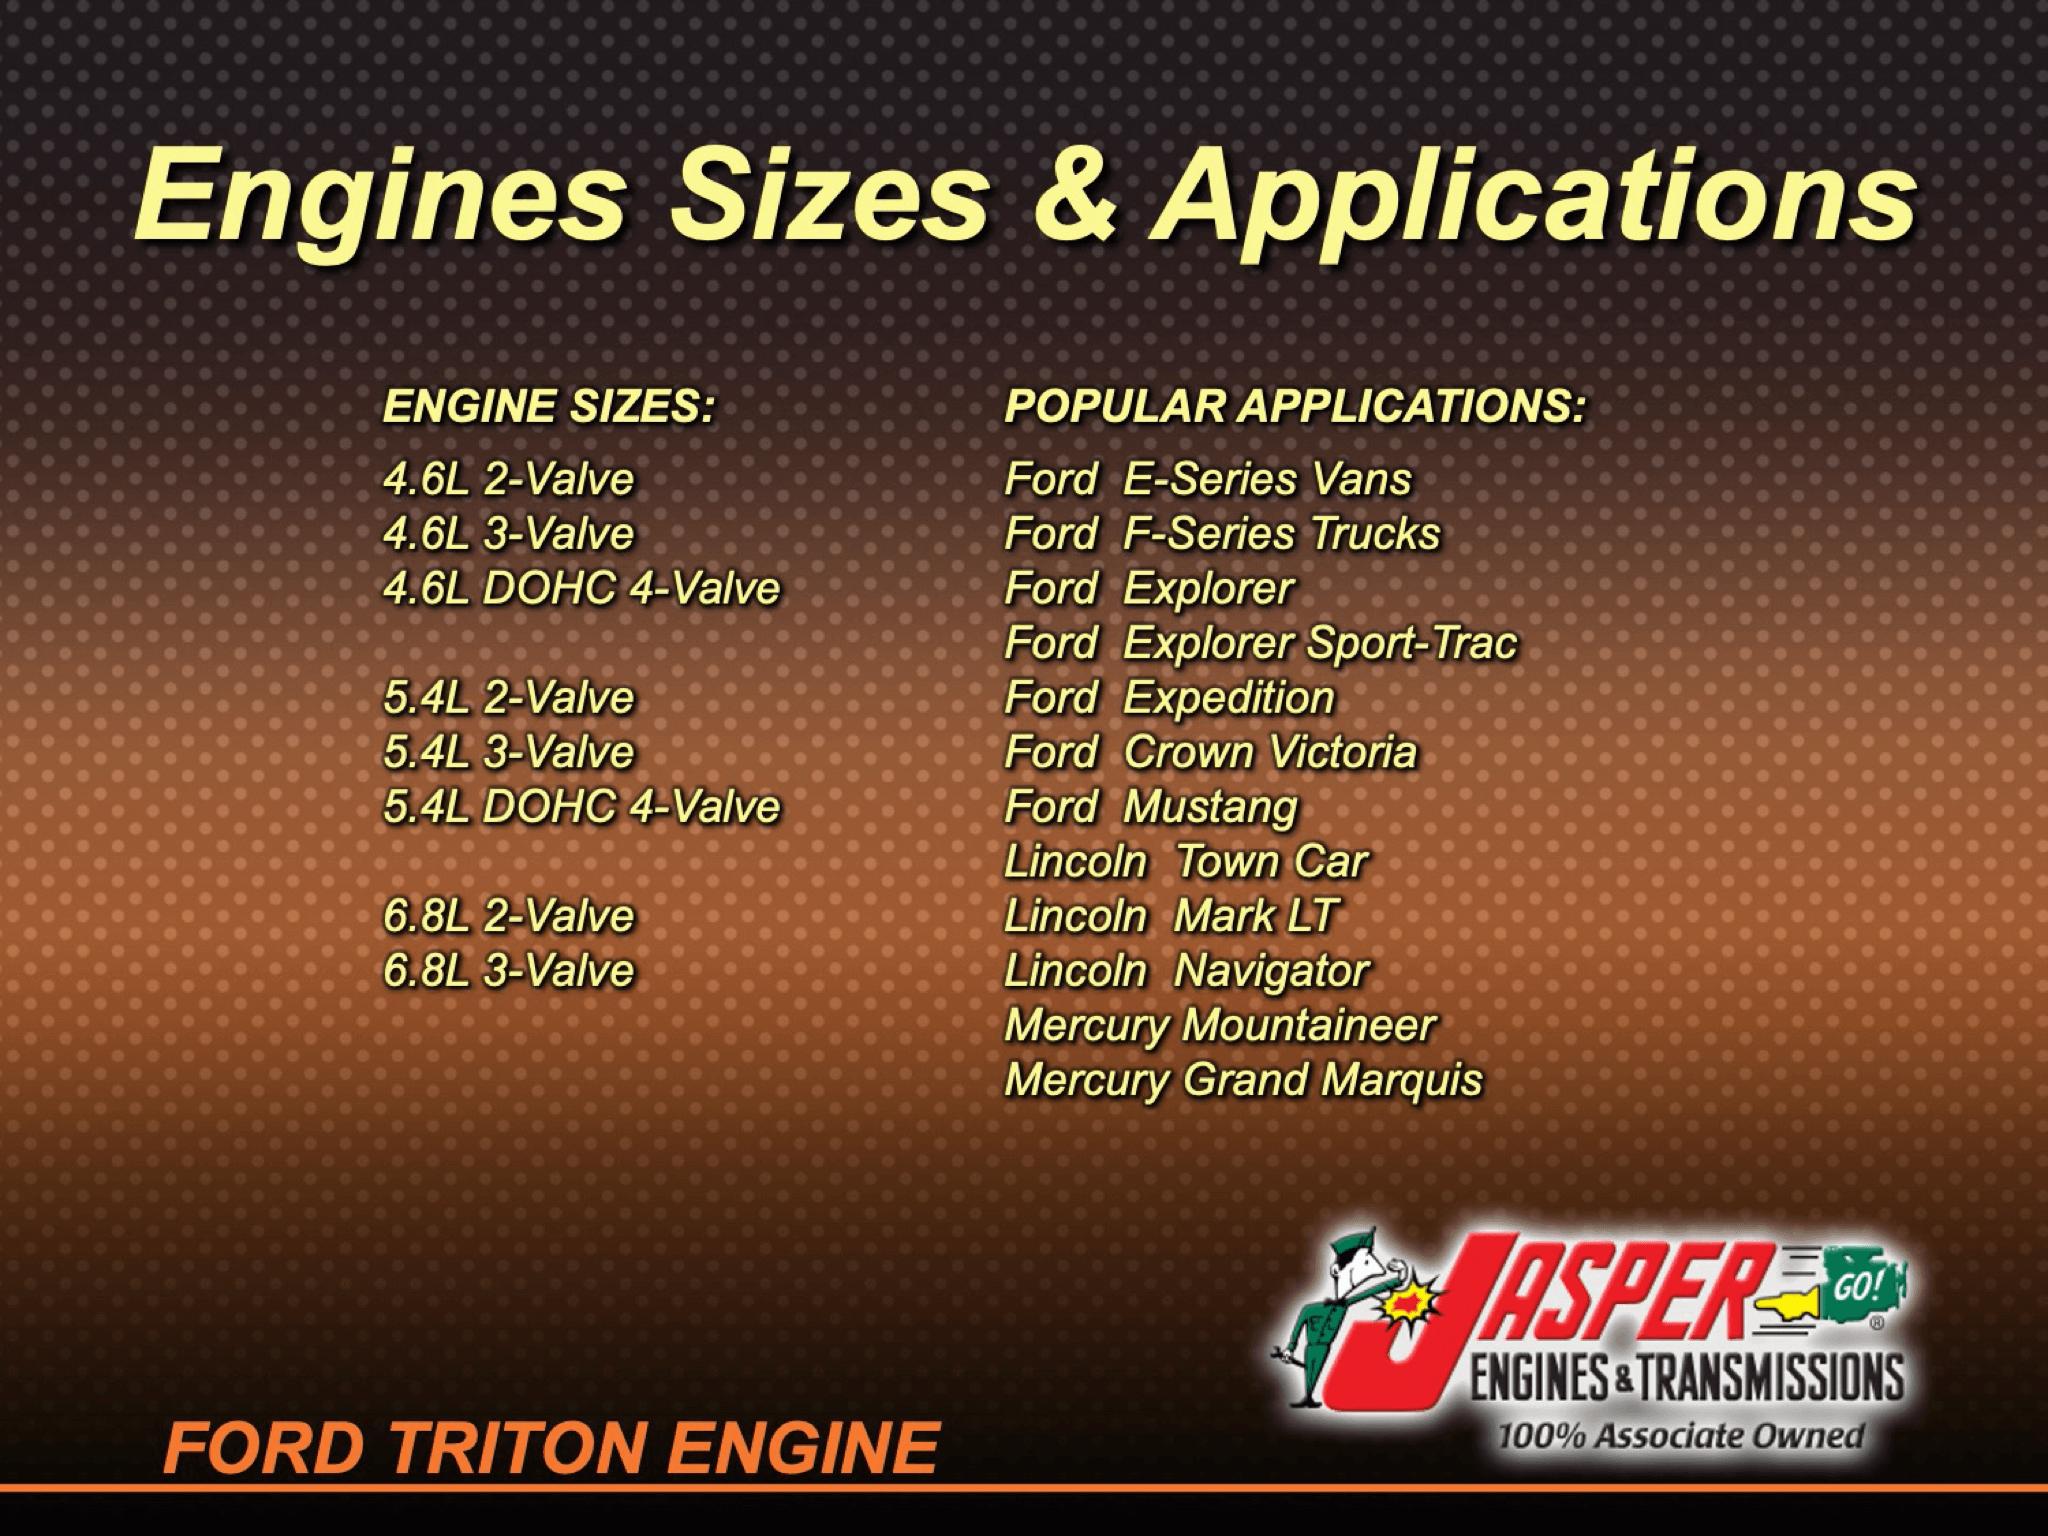 Ford Triton Engines